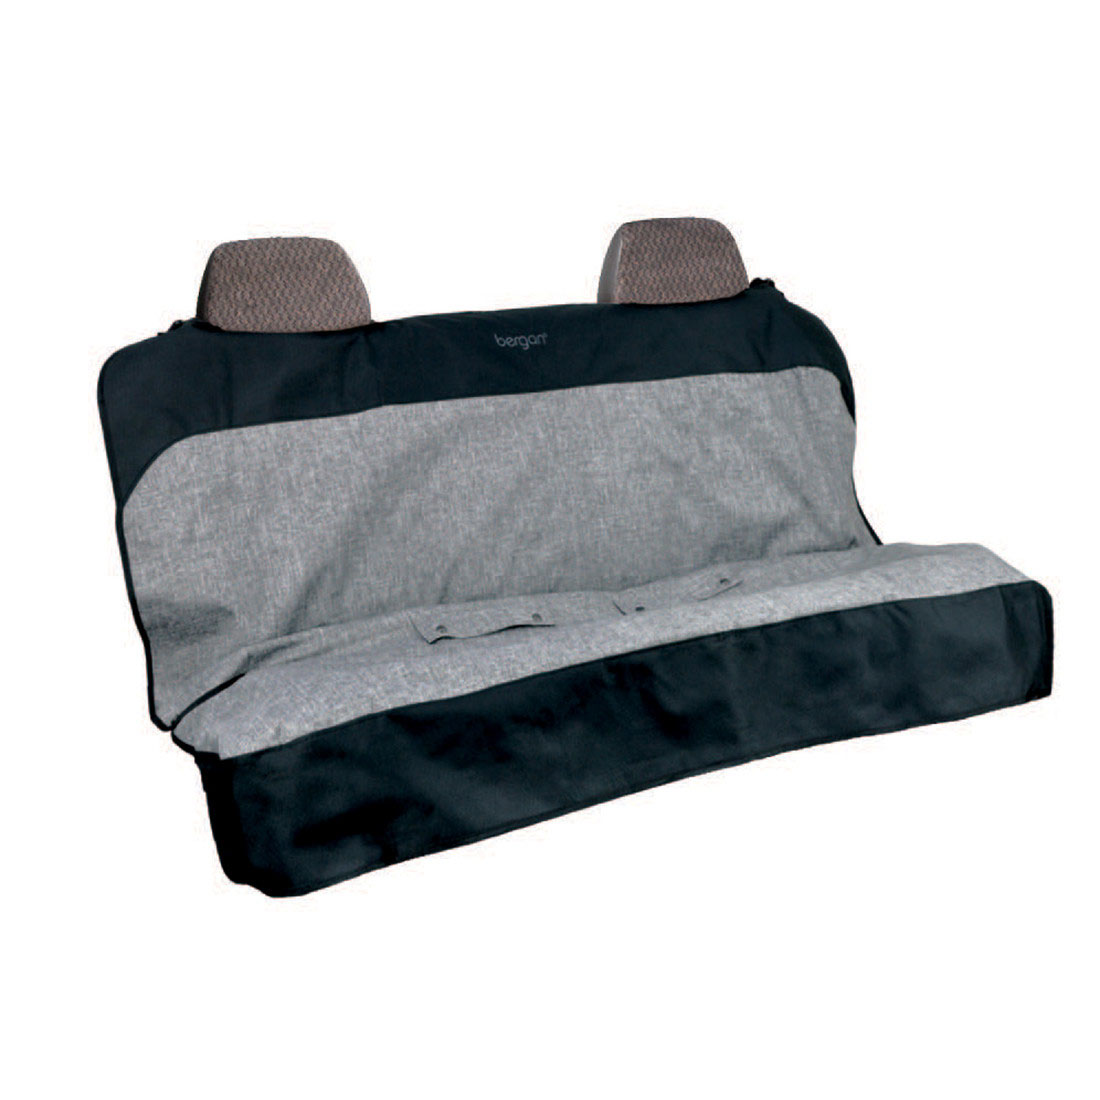 Bergan Auto Bench Seat Protector, Grey/Black, 47-in x 55-in